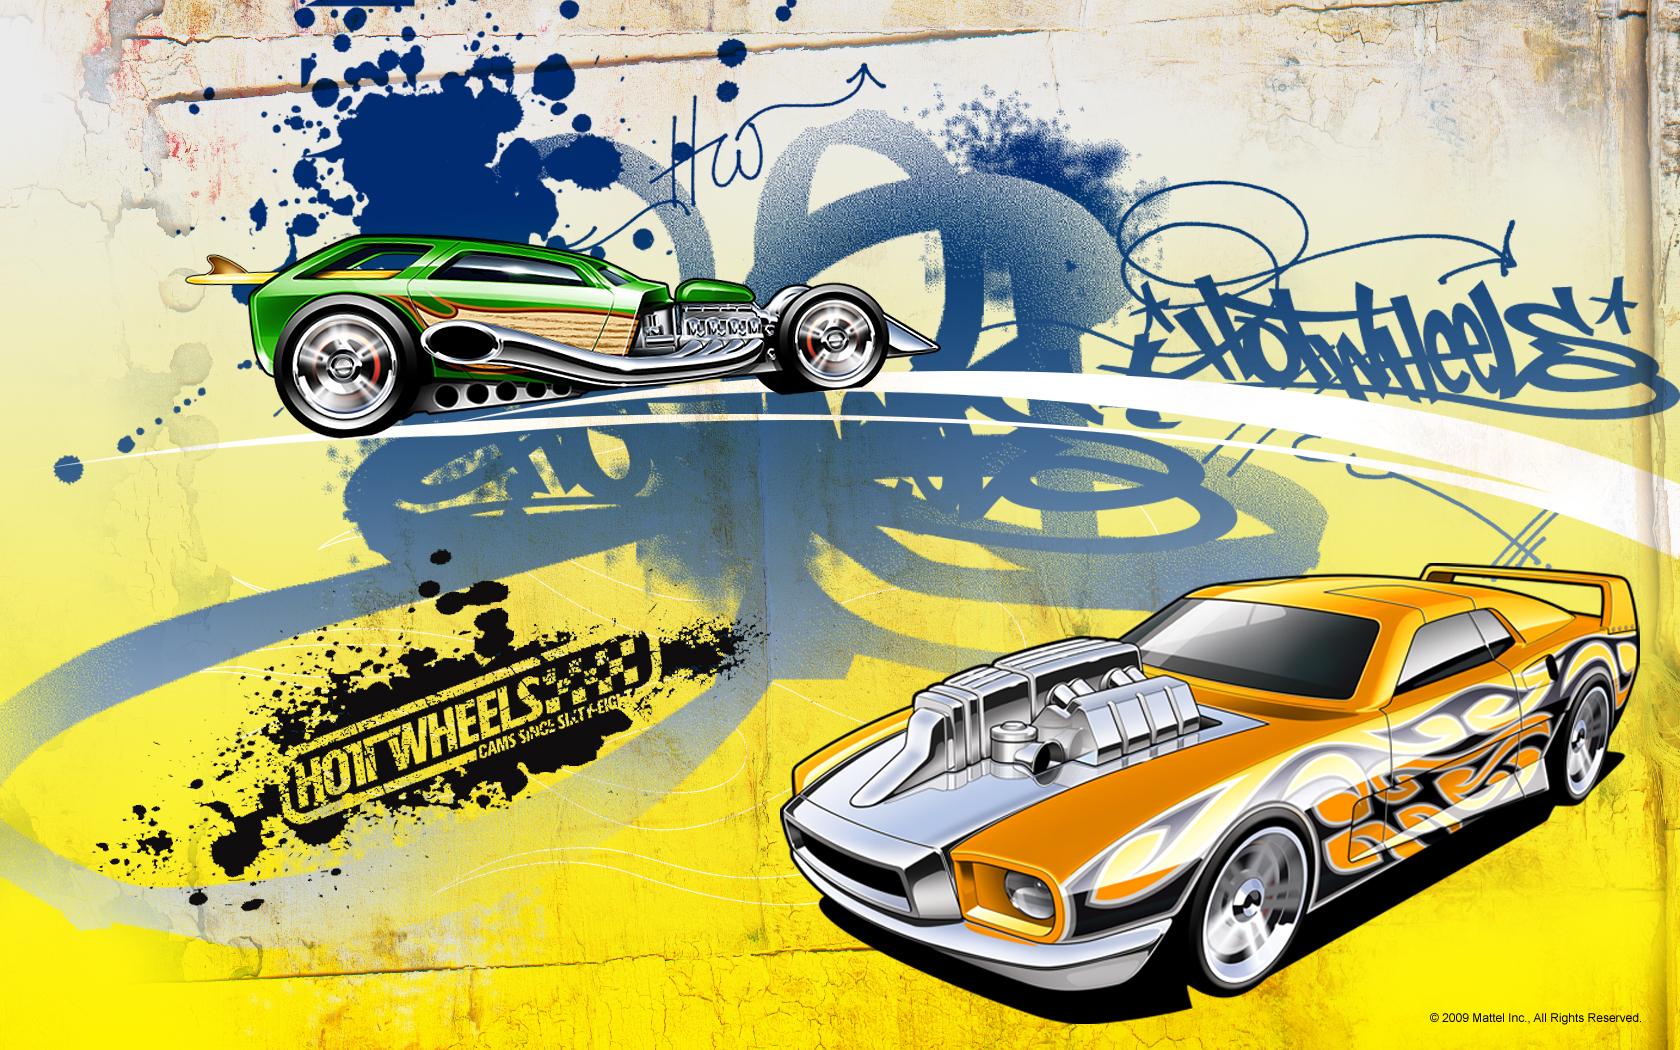 Amazing Wallpaper Logo Hot Wheel - 1680x1050  Photograph_99335.org/get/20323/1680x1050